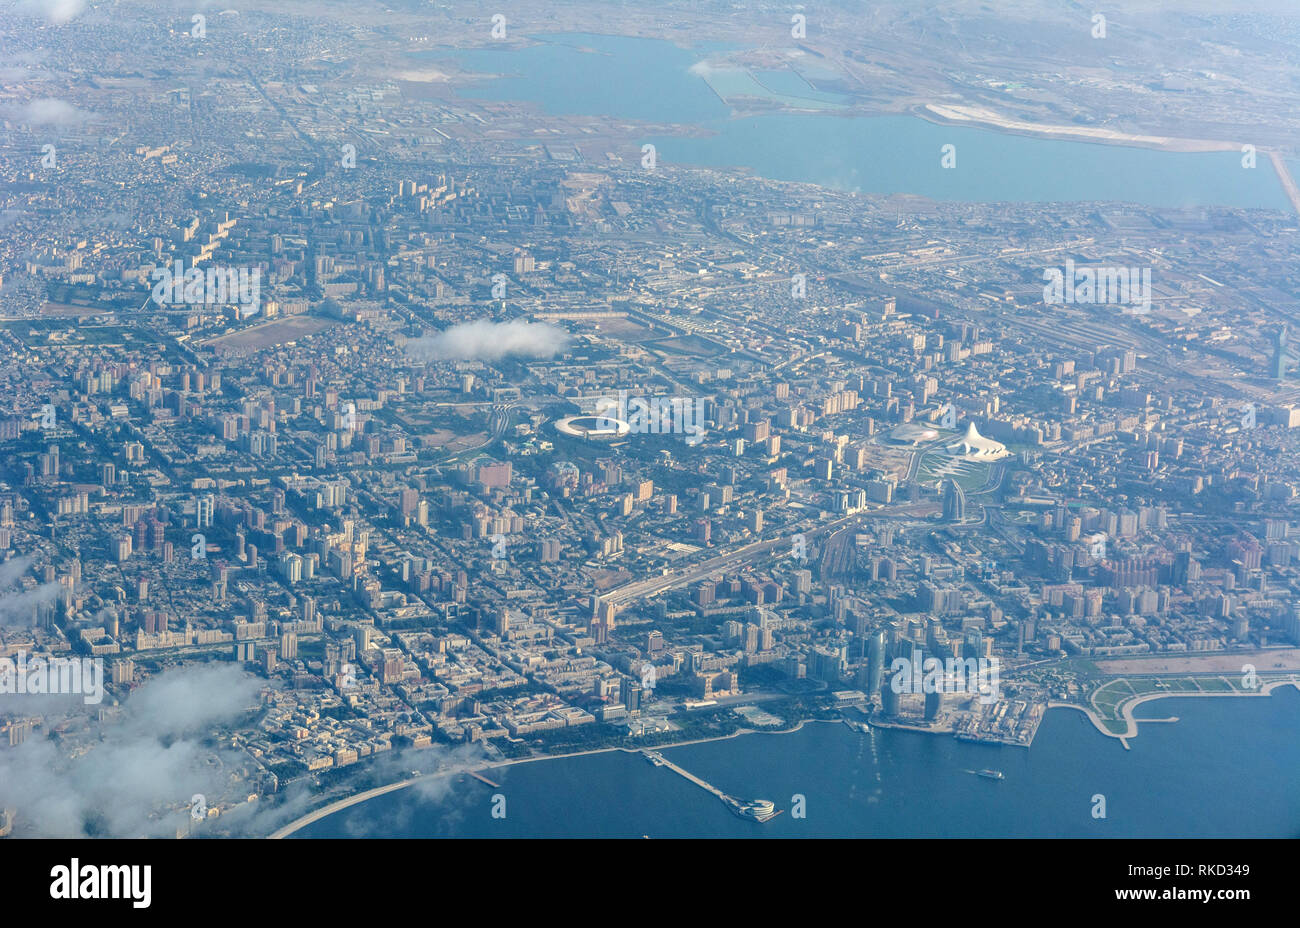 Aerial view over Baku, the capital of Azerbaijan. Stock Photo